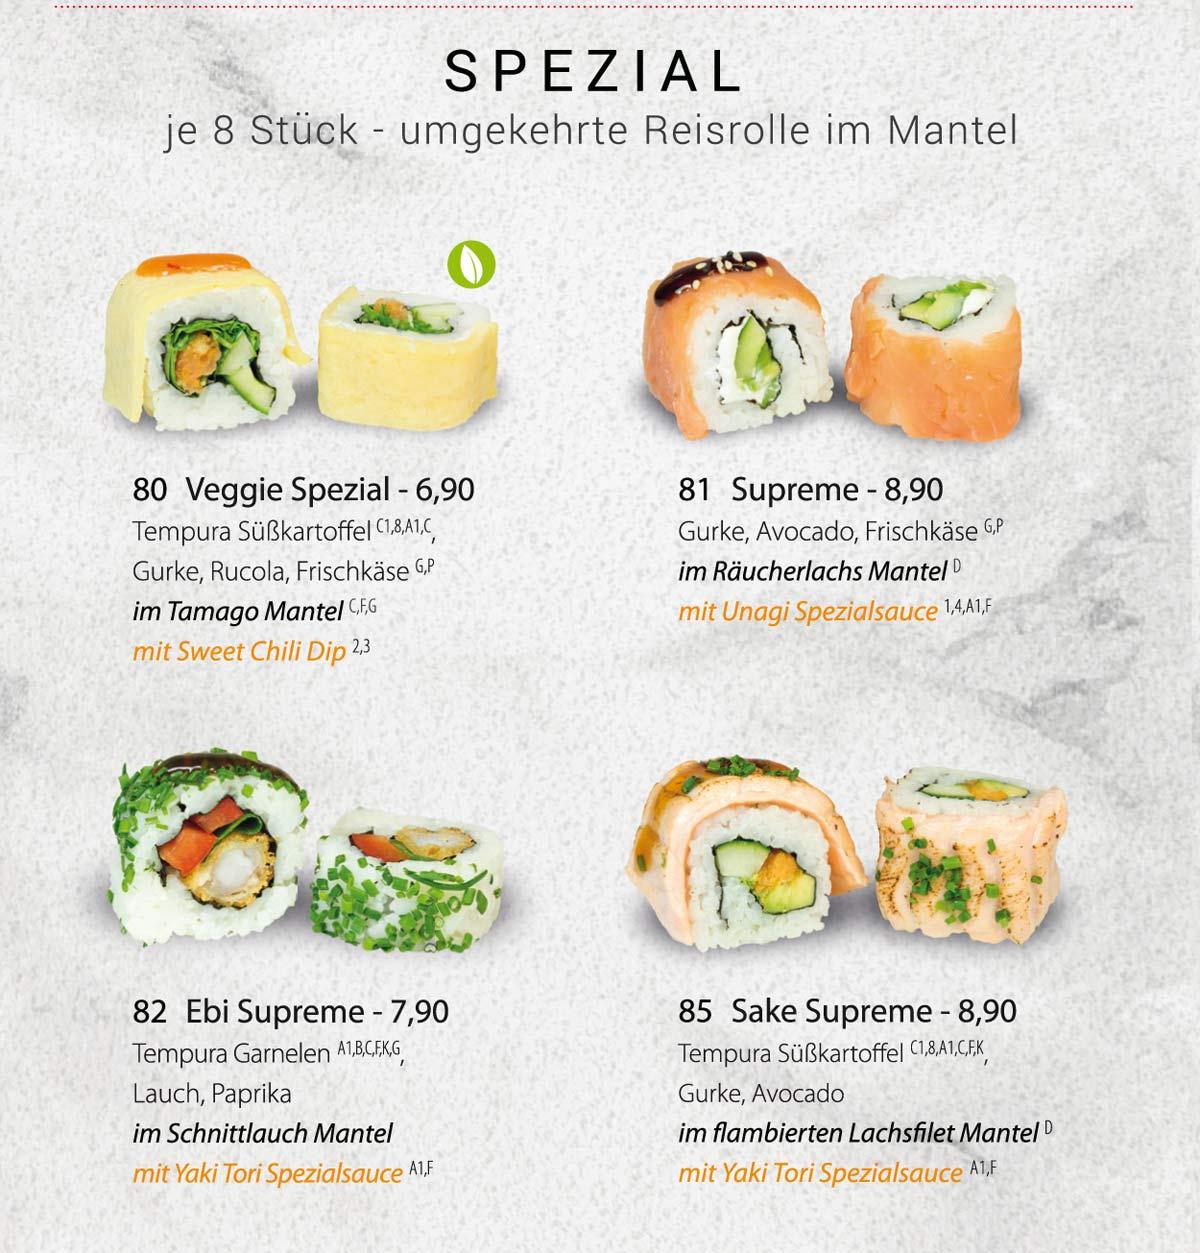 Sushifreunde | Speisekarte | Spezial - Umgekehrte Reisrolle im Mantel